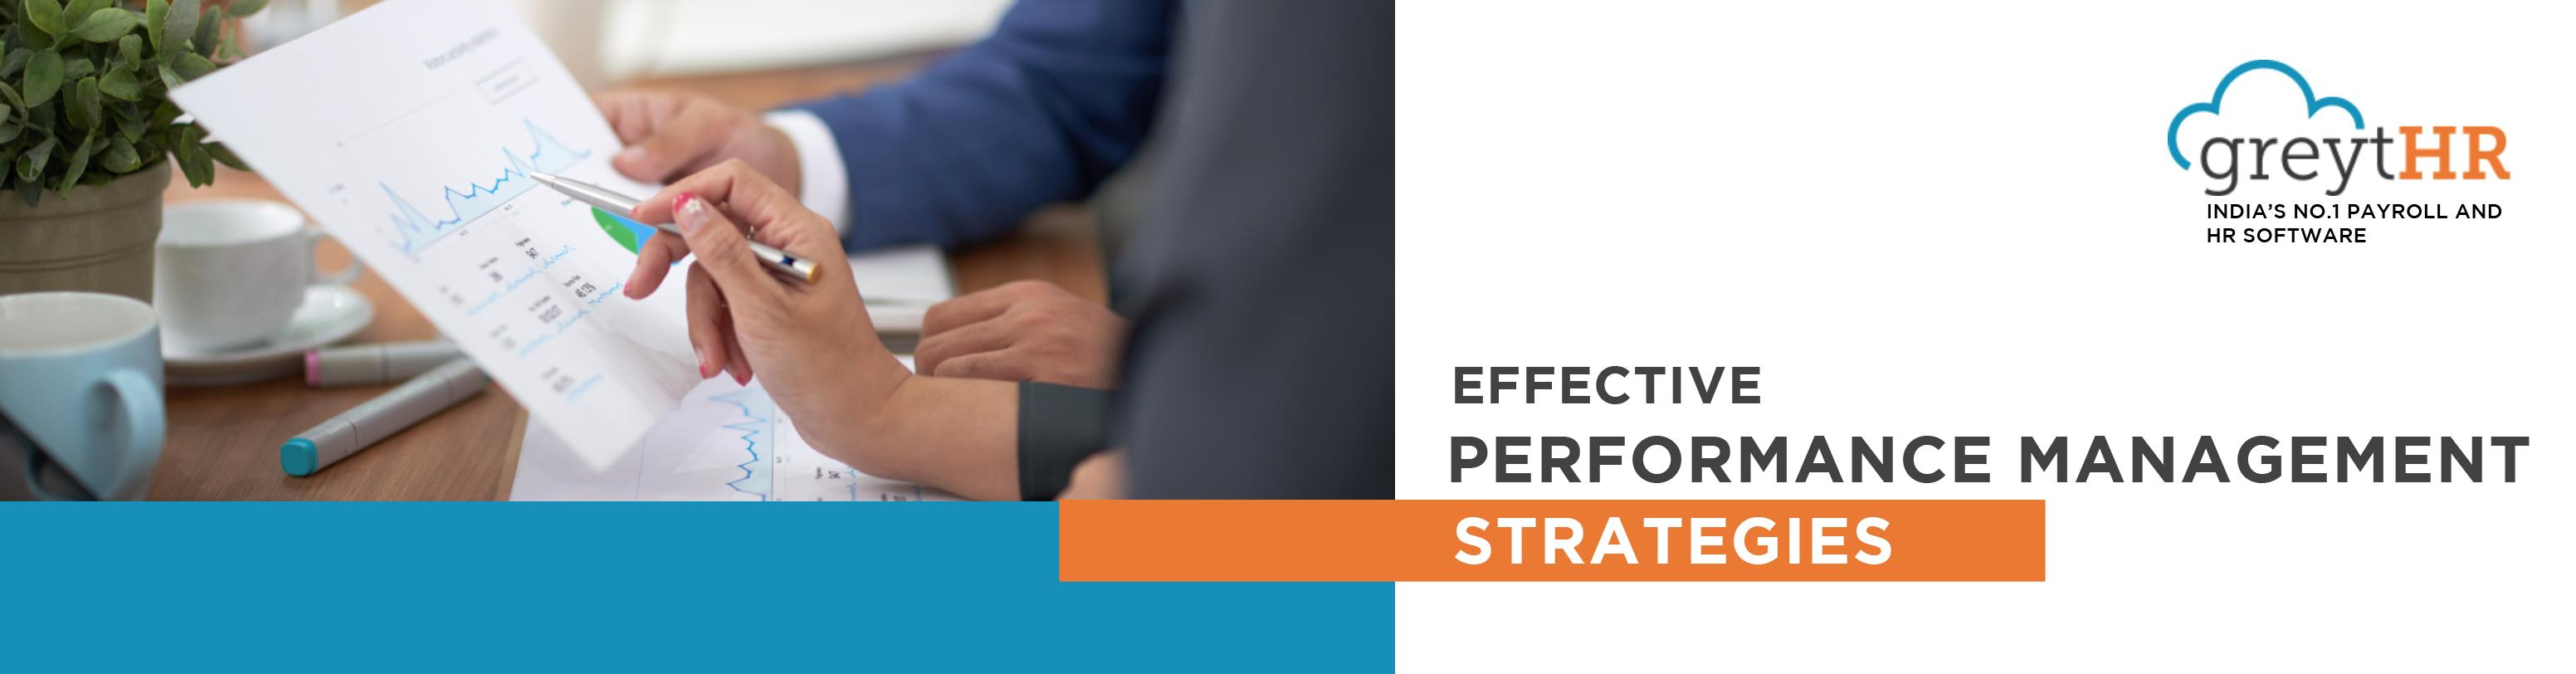 Effective Performance Management Strategies